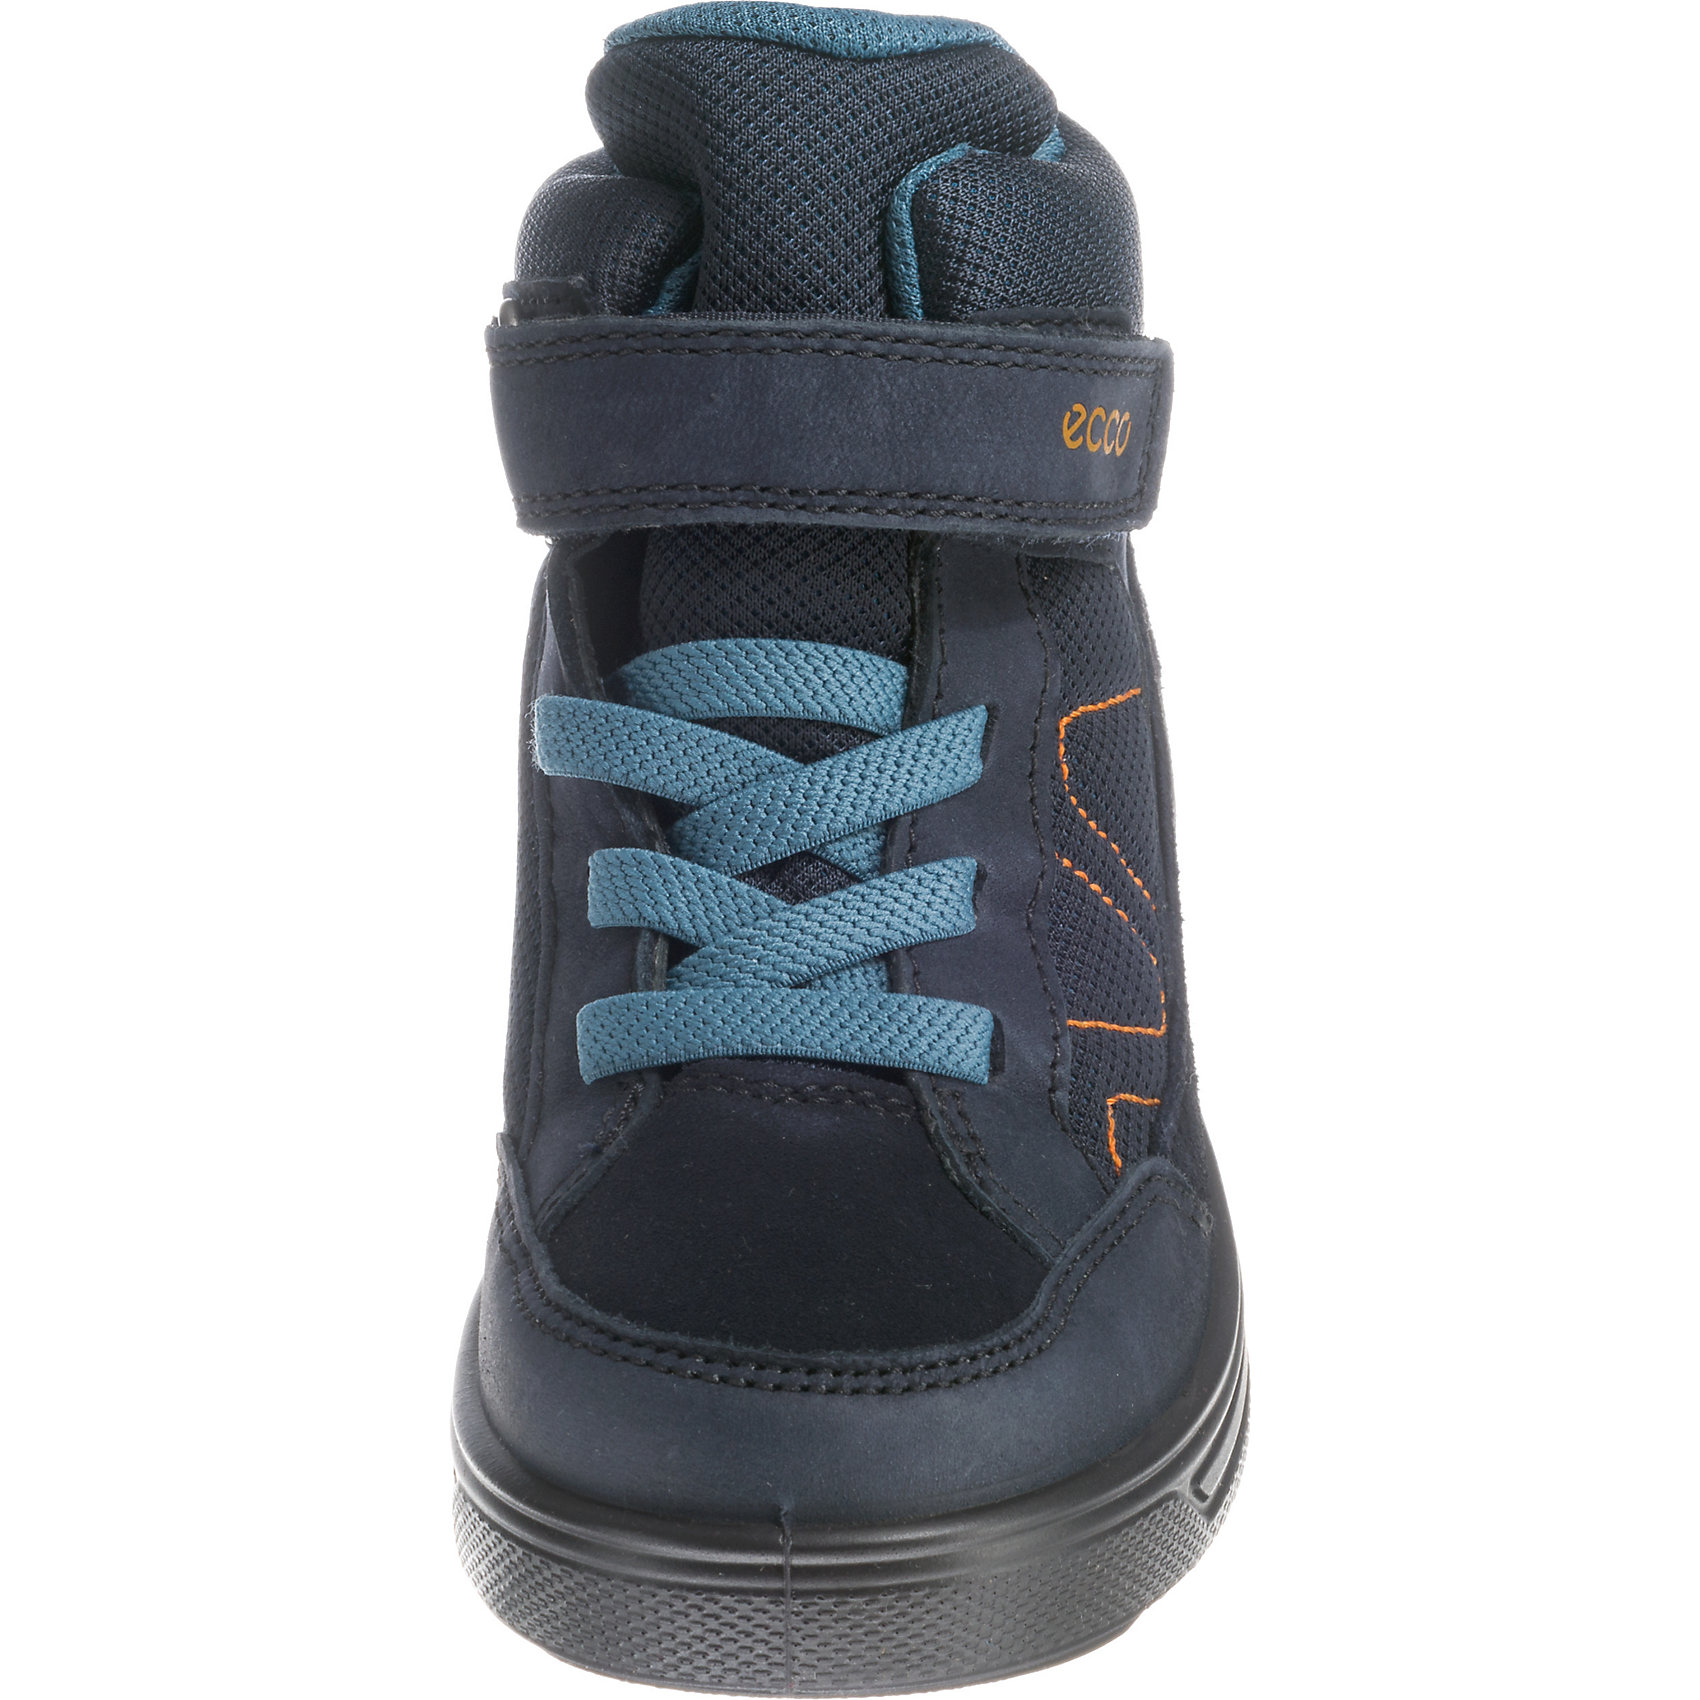 Sneakers High GORE TEX für Jungen, ecco